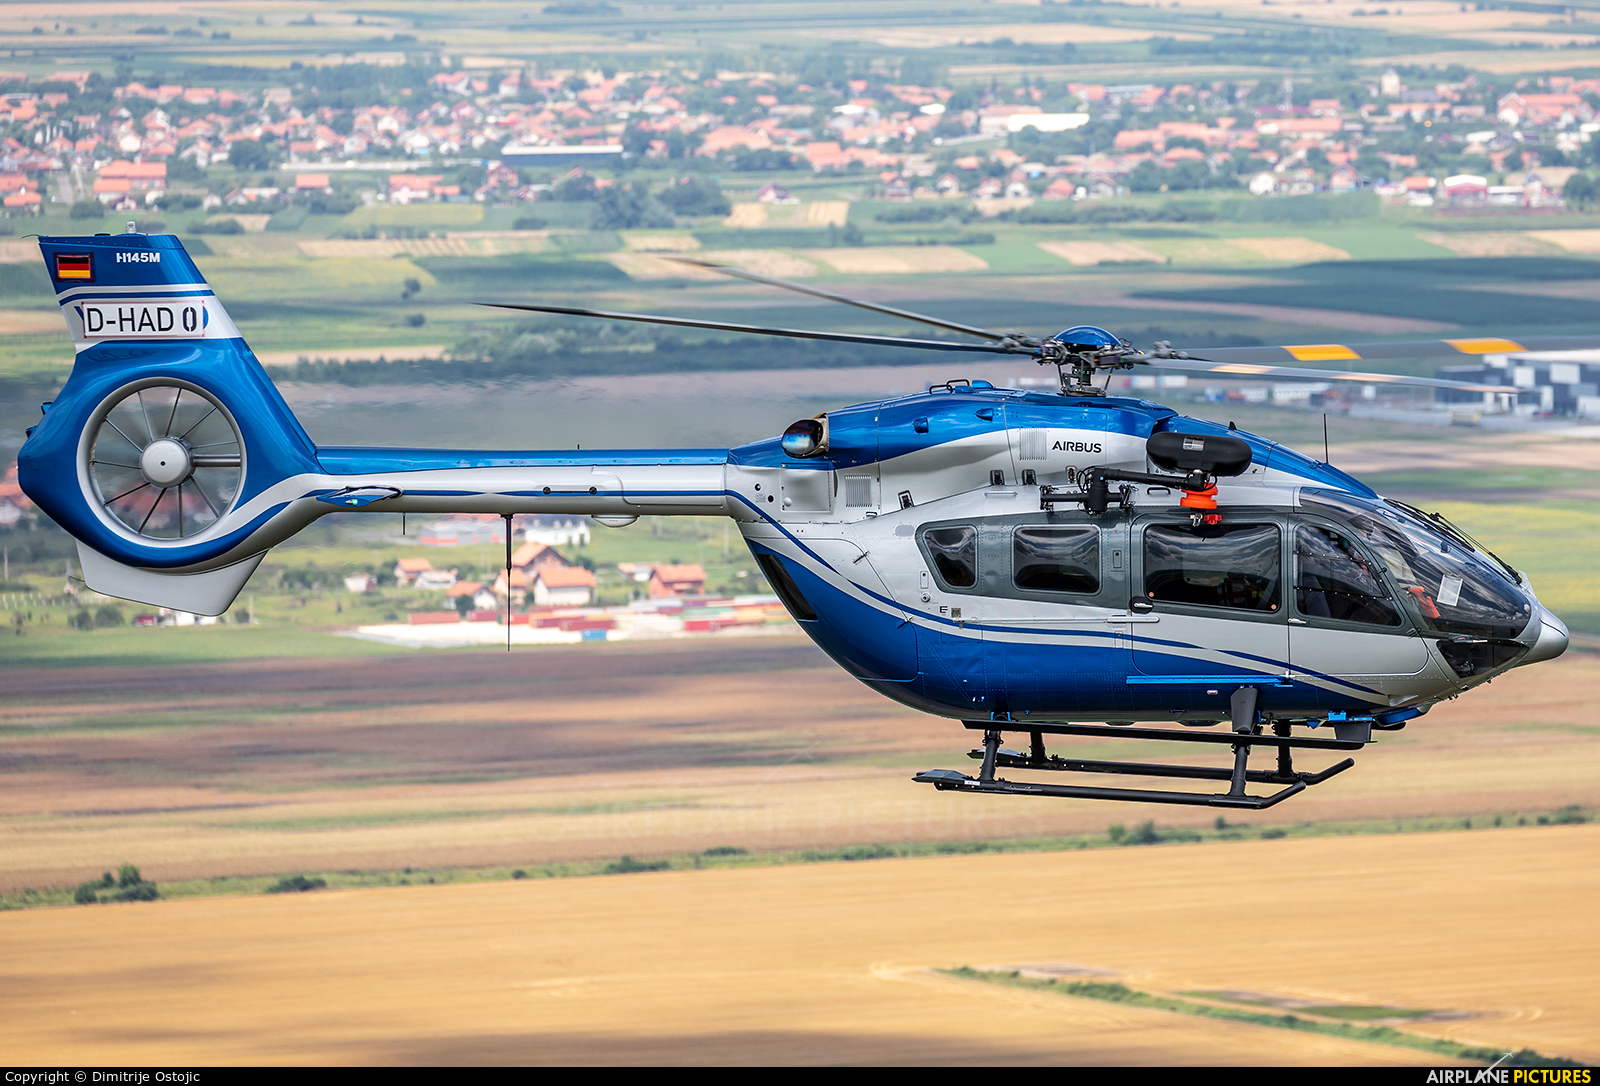 Serbia - Police YU-MED aircraft at In Flight - Serbia